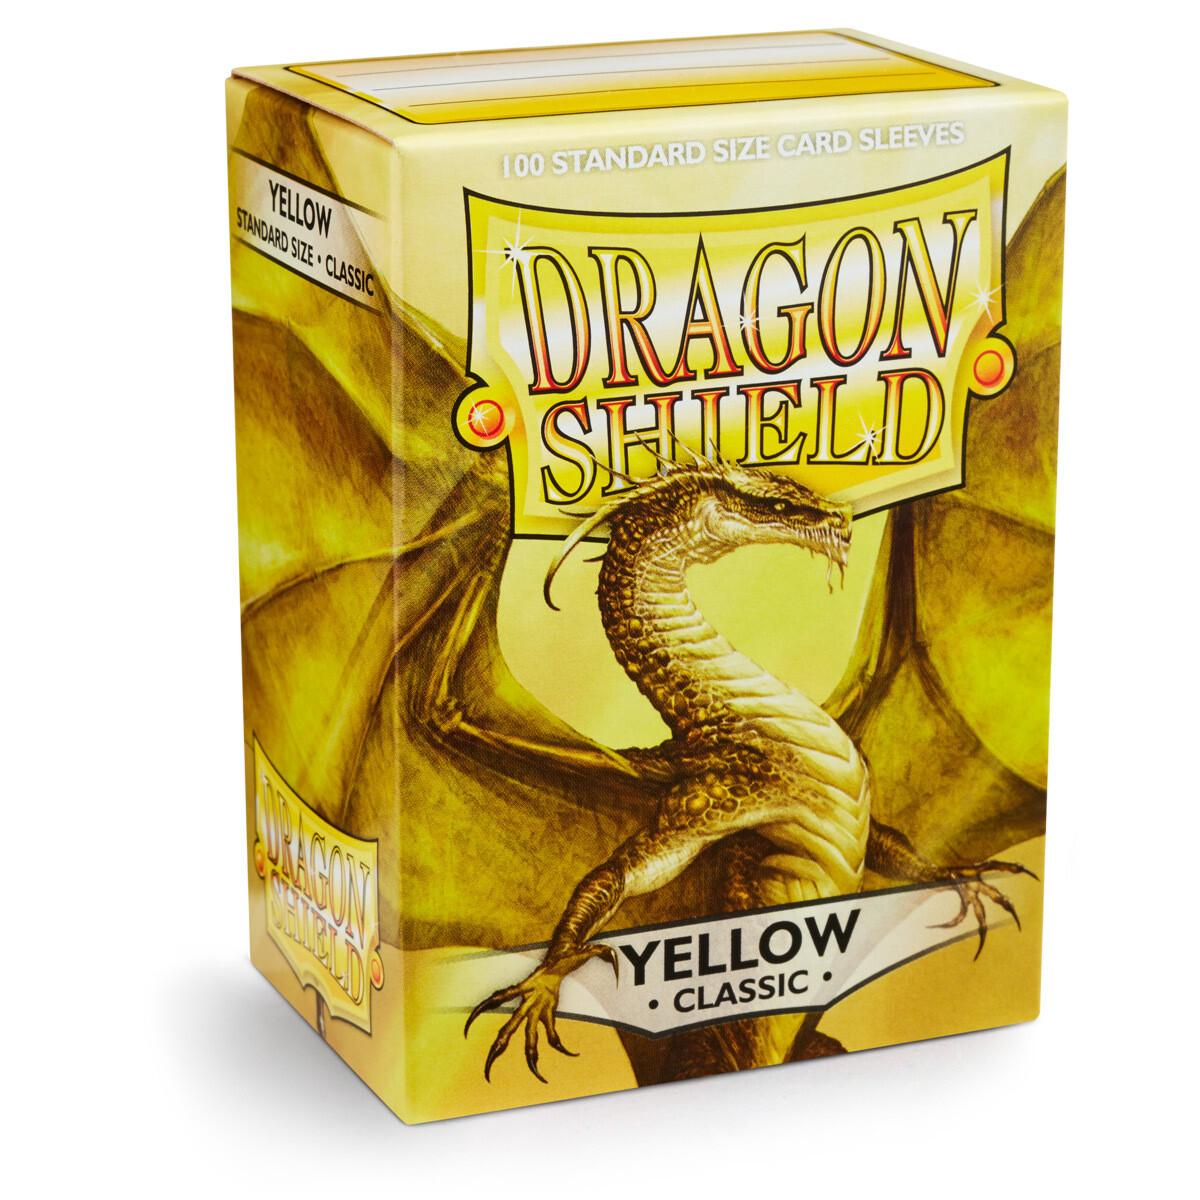 Dragon Shield 100 Sleeves - Yellow